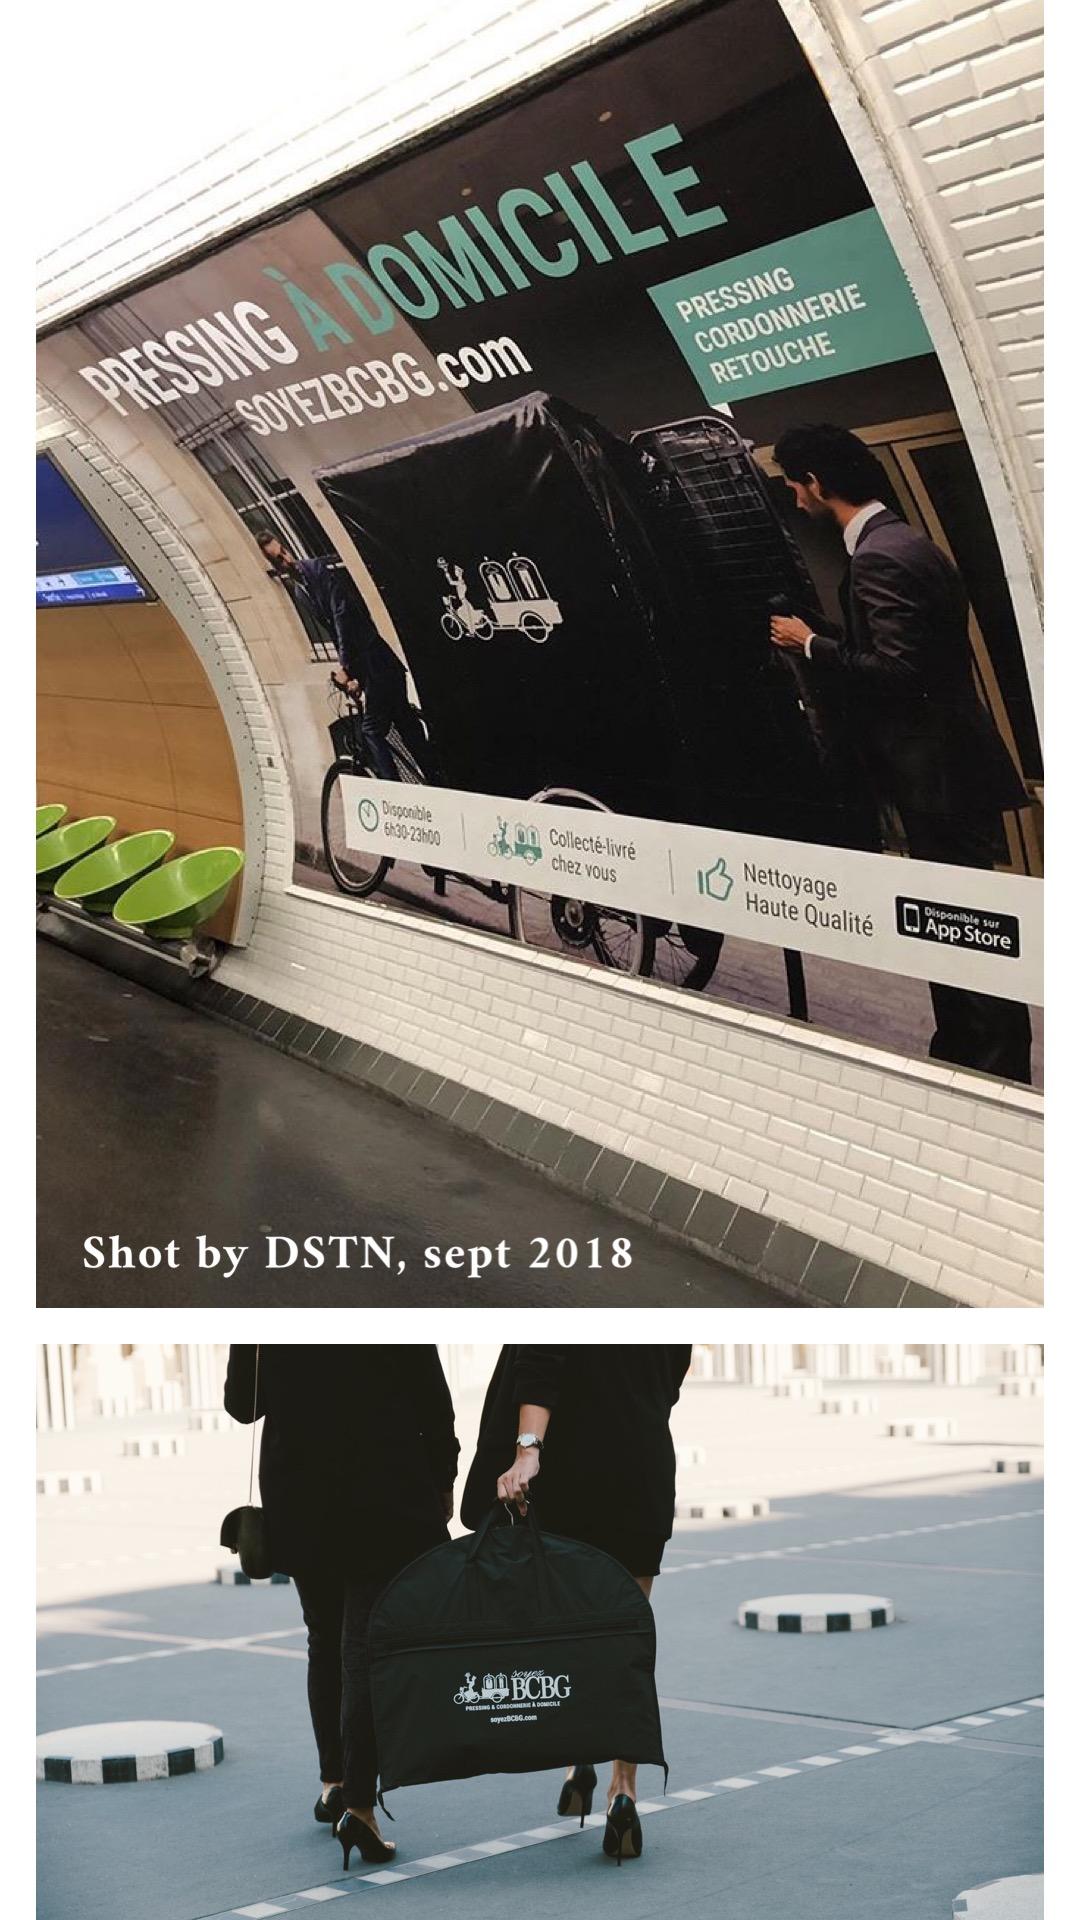 campagne-metro-soyezbcbg-dstn-3.JPG